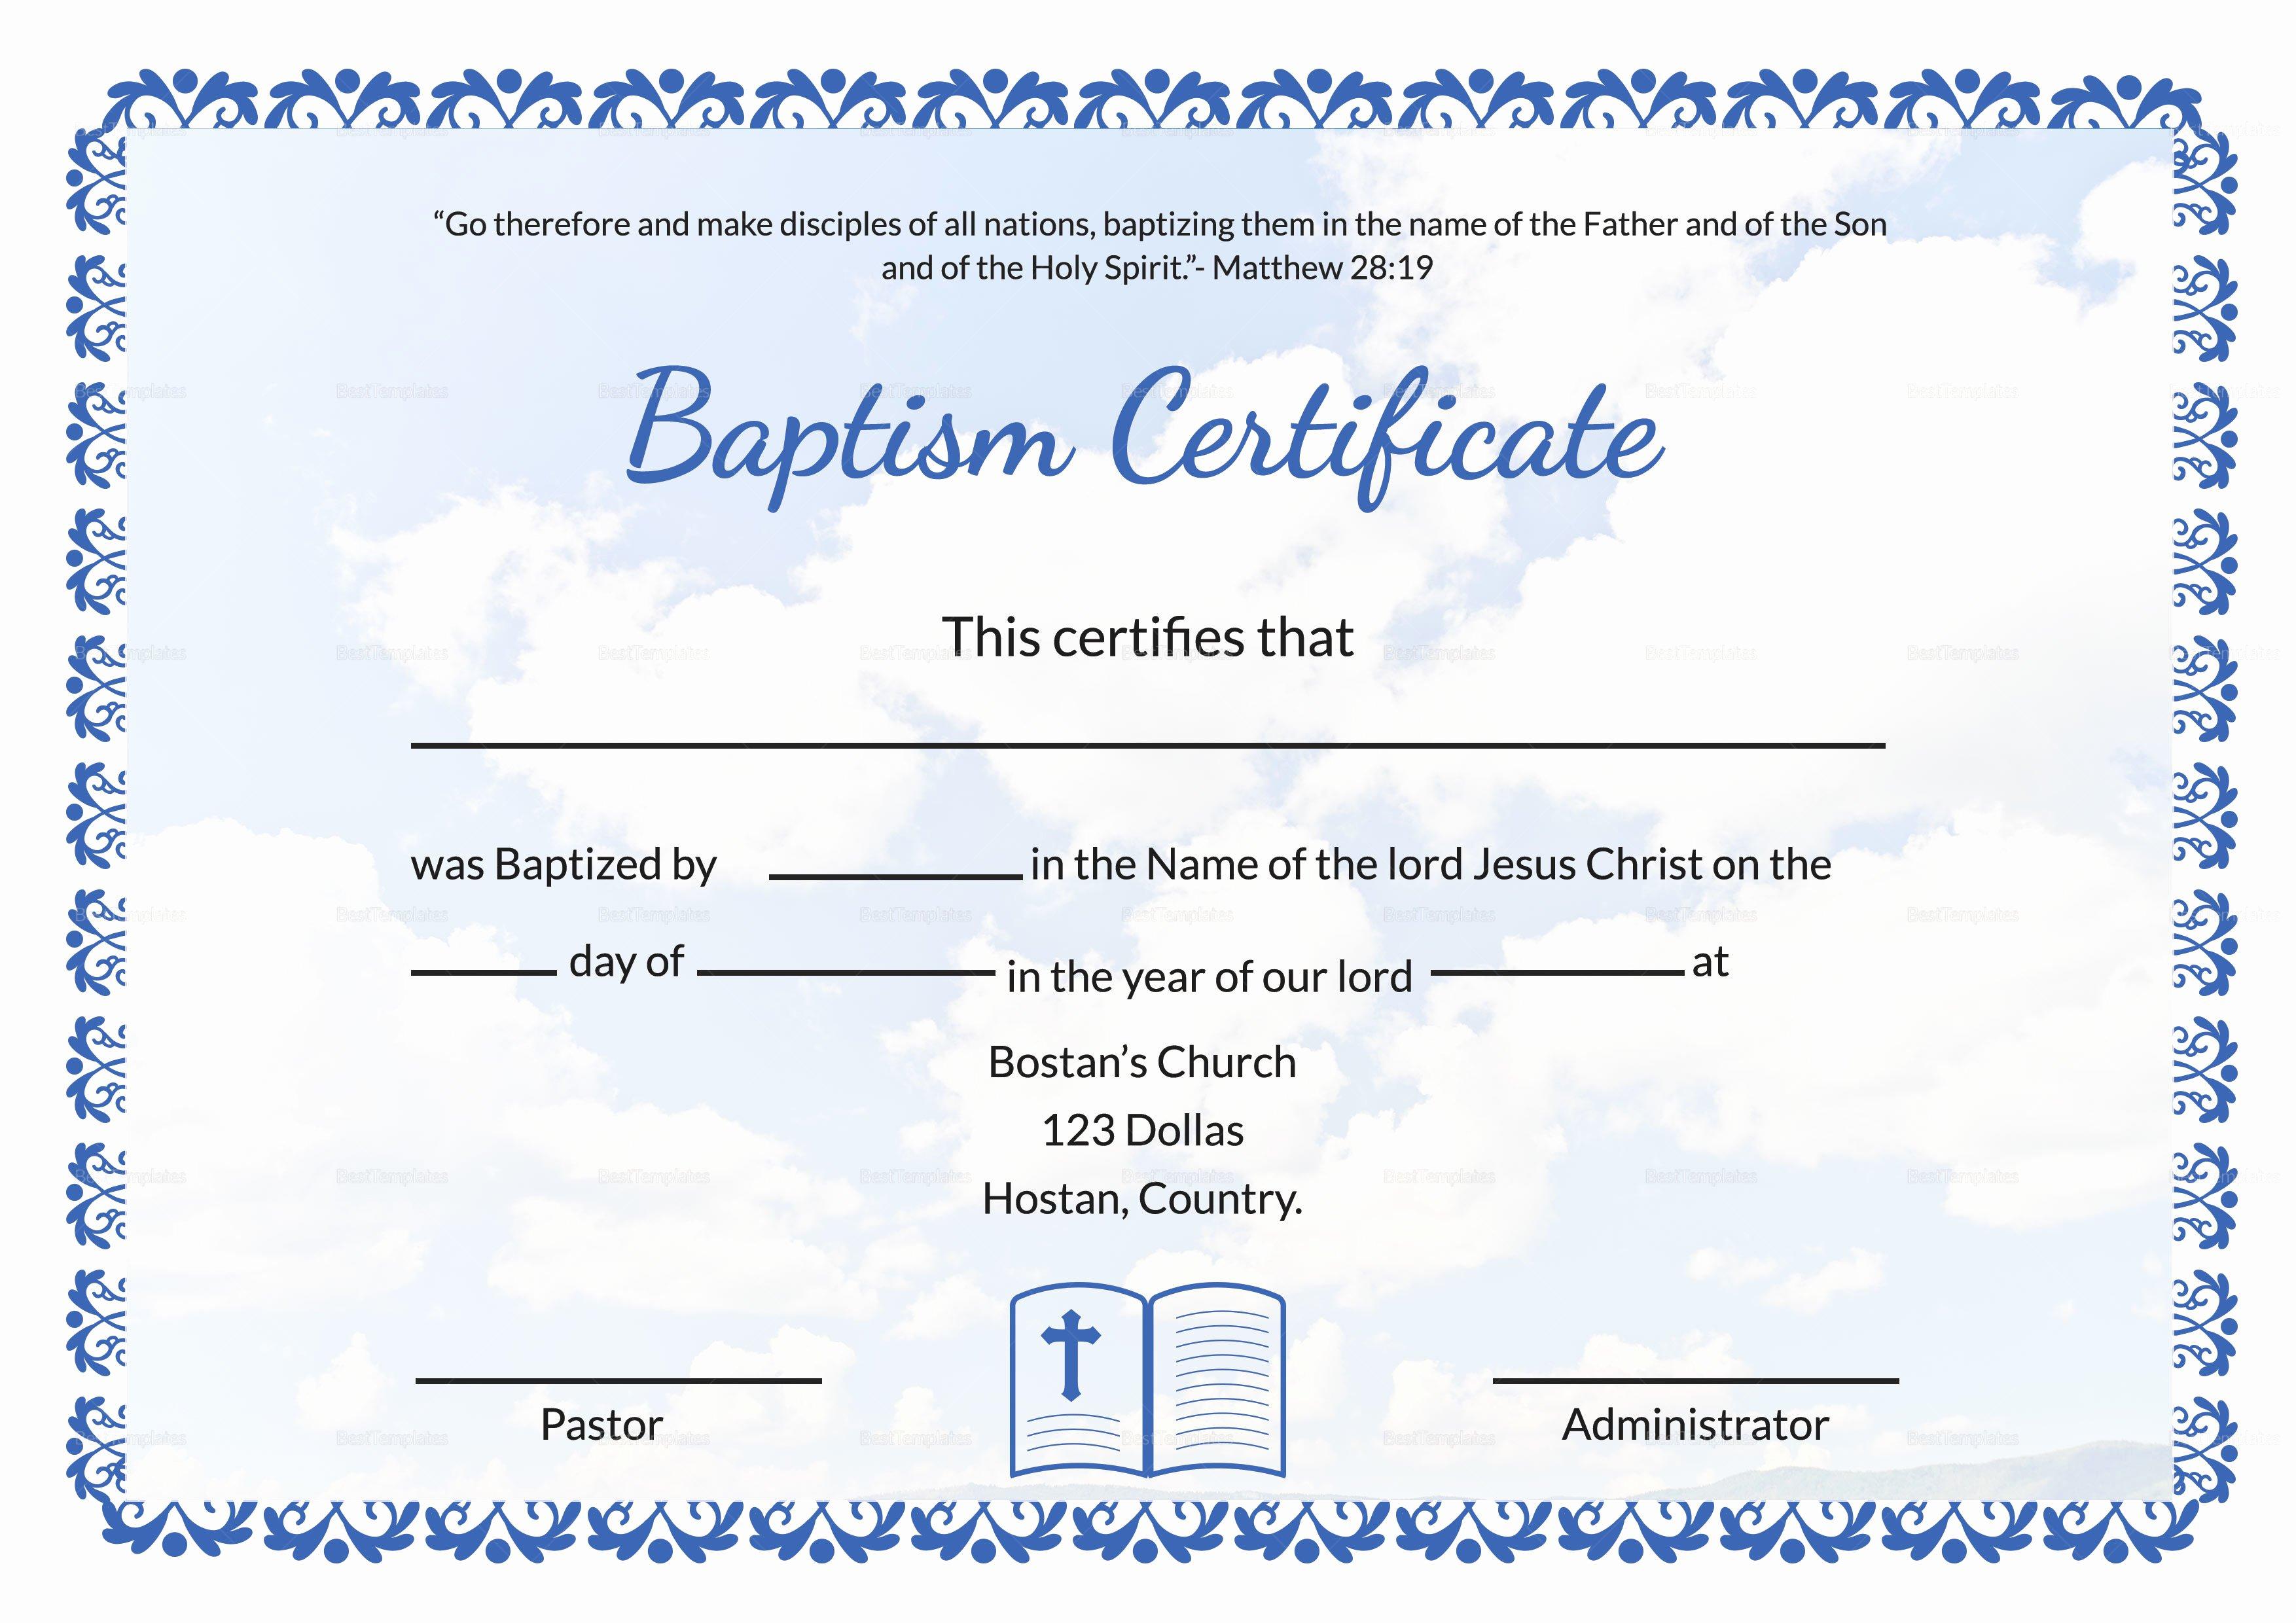 Catholic Baptism Certificate Template Luxury Baptismal Certificate Template Baptism Publisher Microsoft